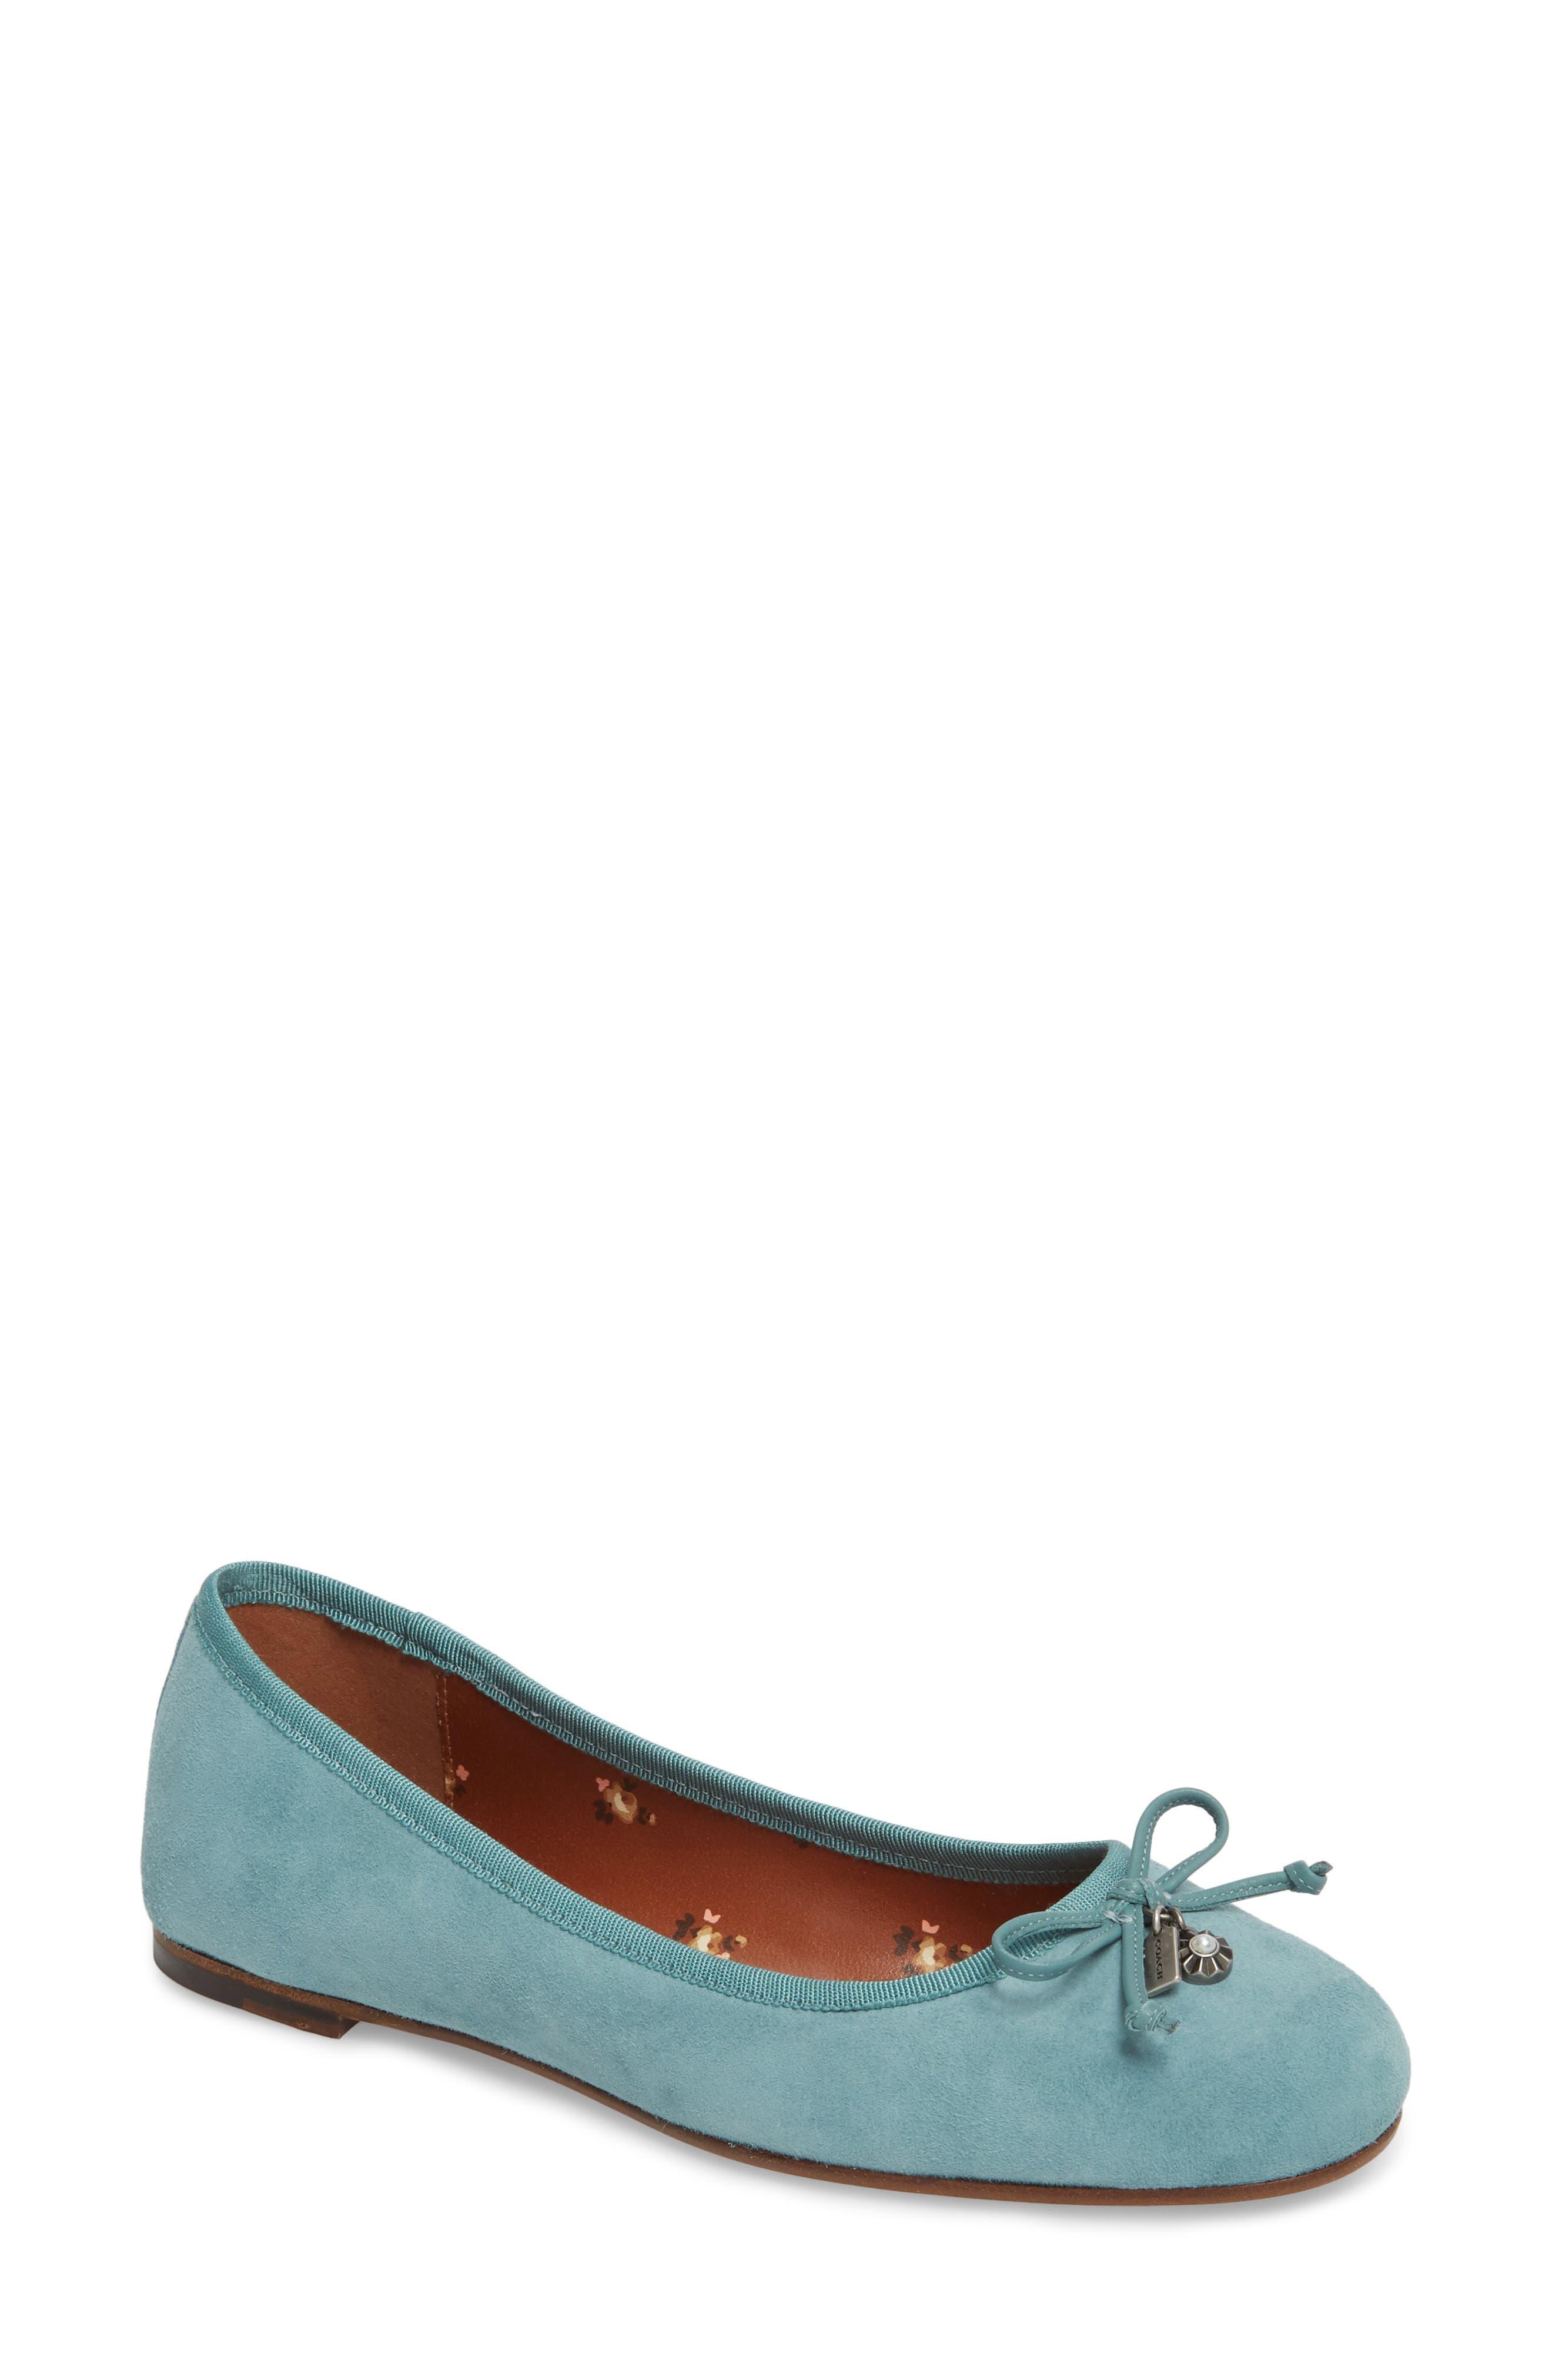 Lola Ballet Flat,                             Main thumbnail 1, color,                             Marine Leather